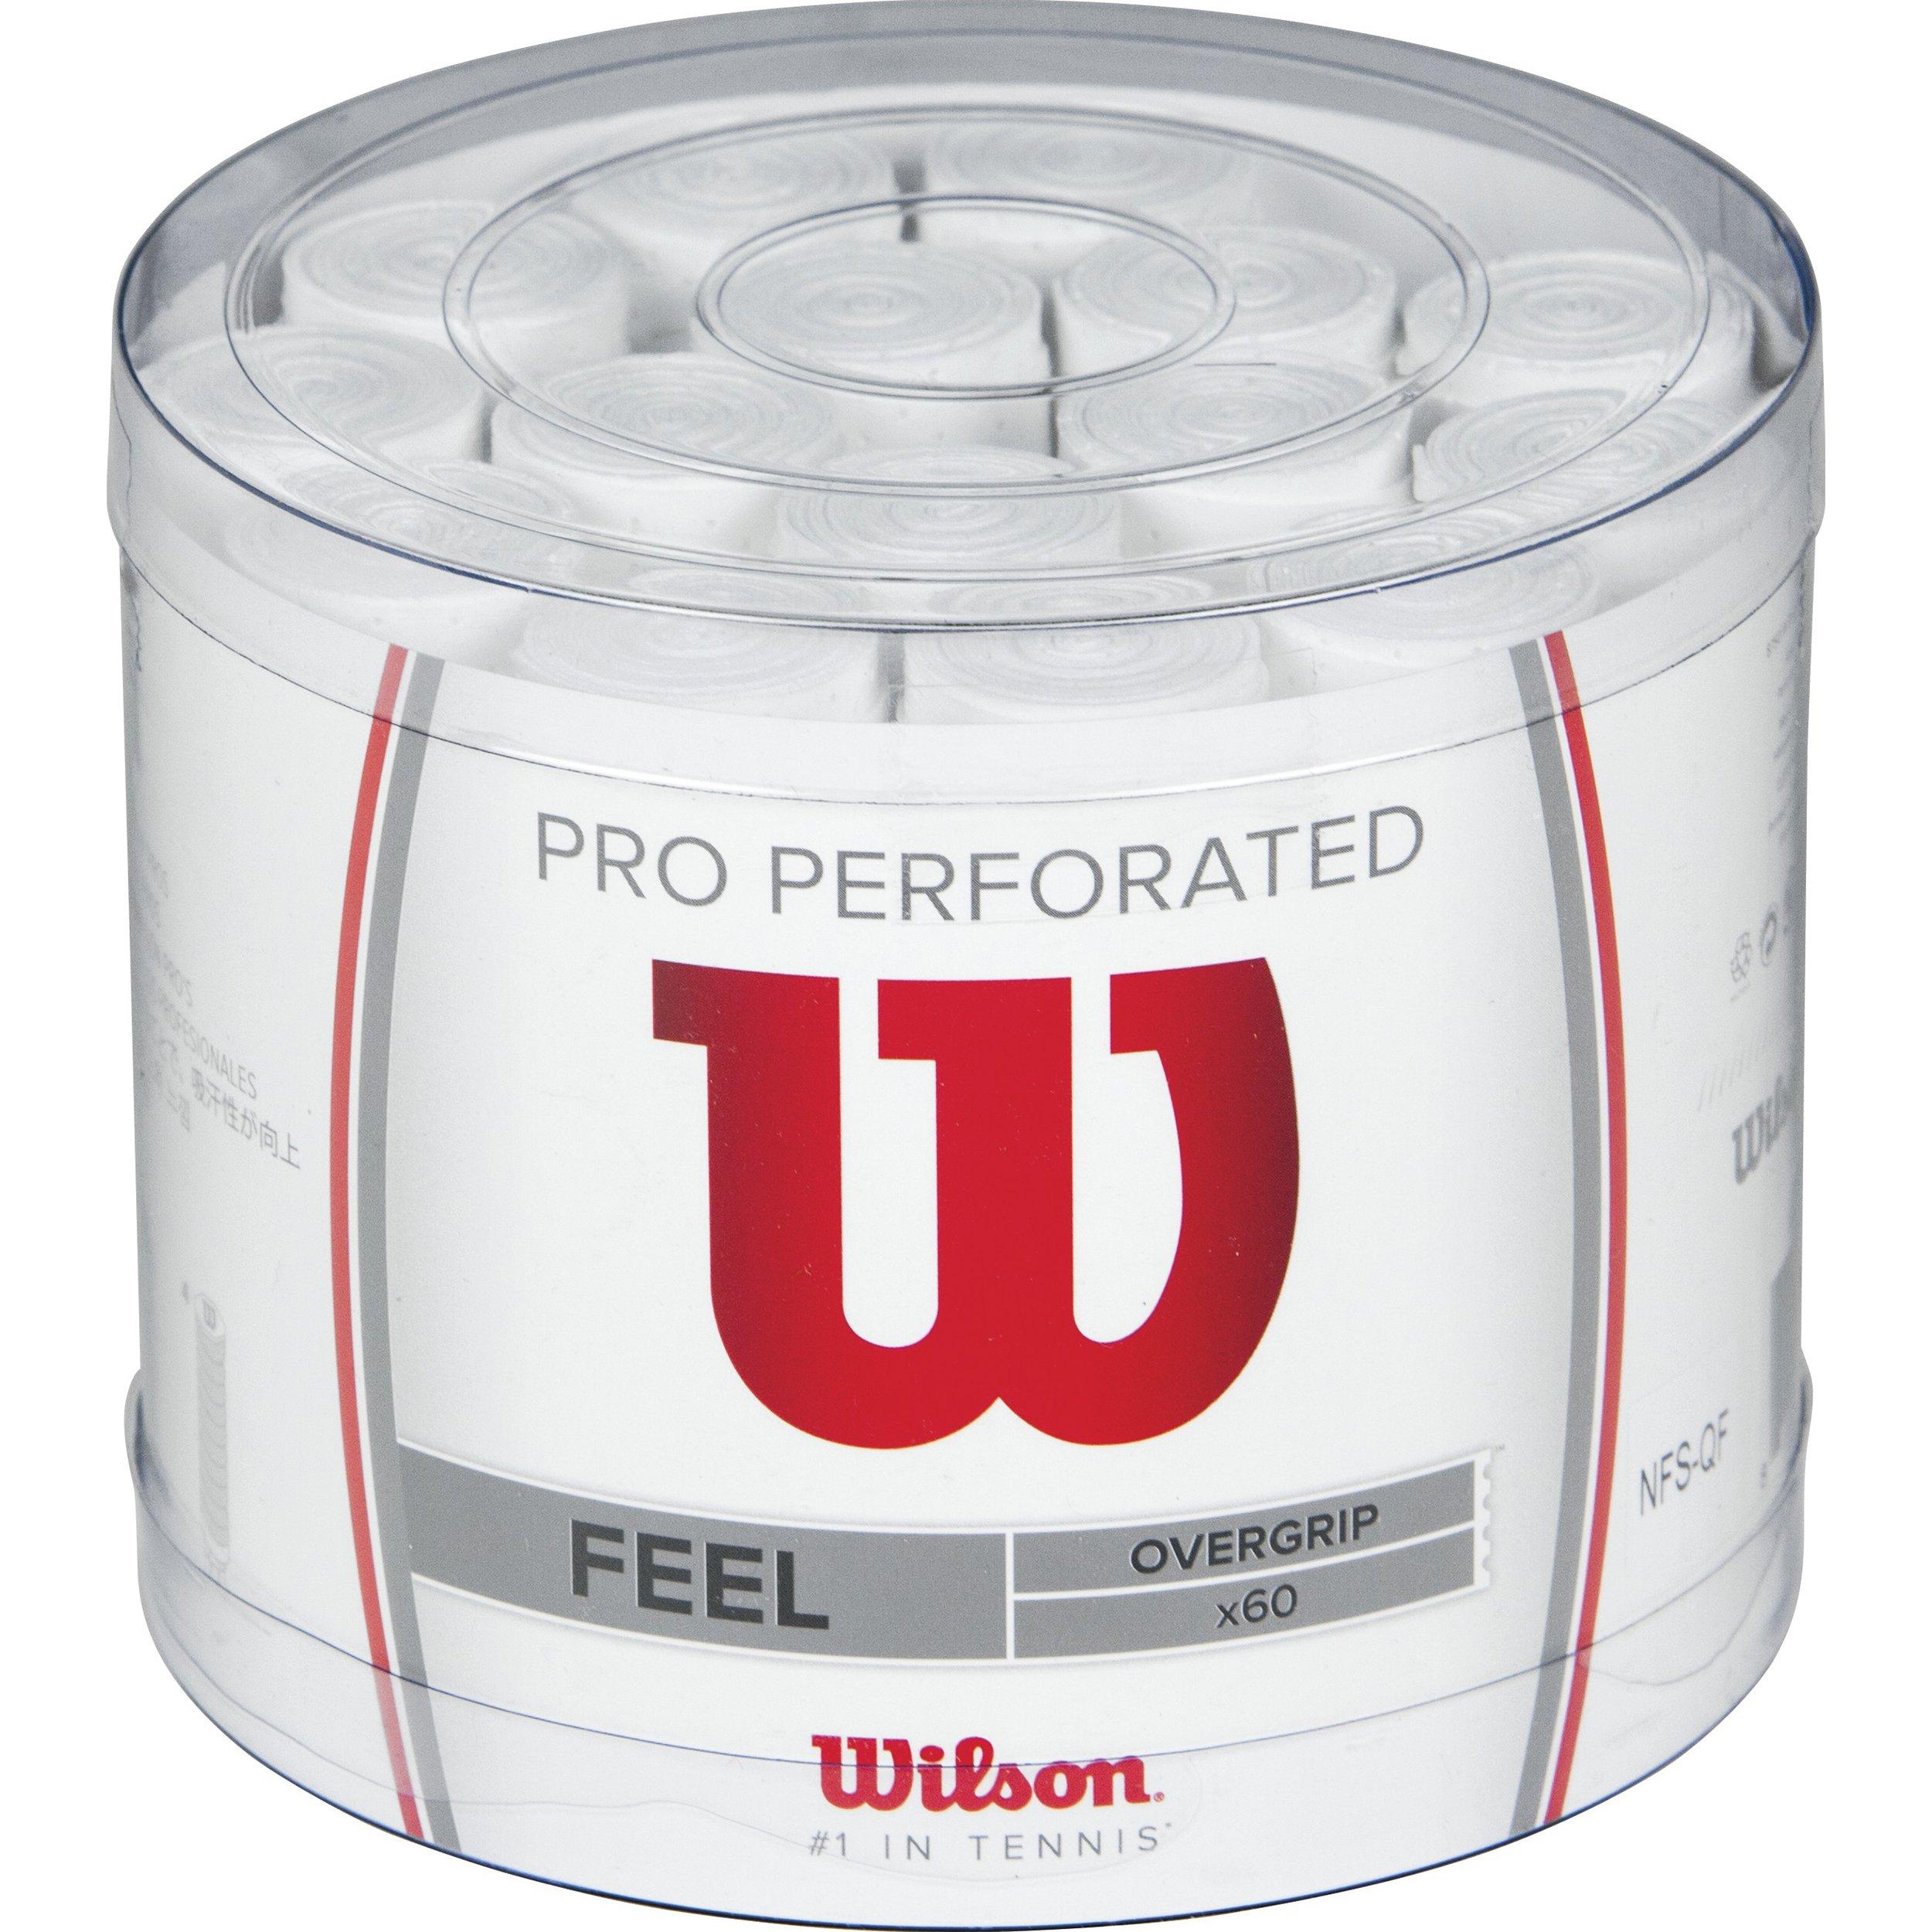 Wilson Pro OG Perf Bucket 60 WH Overgrip, Unisex, Blanco, Talla Única product